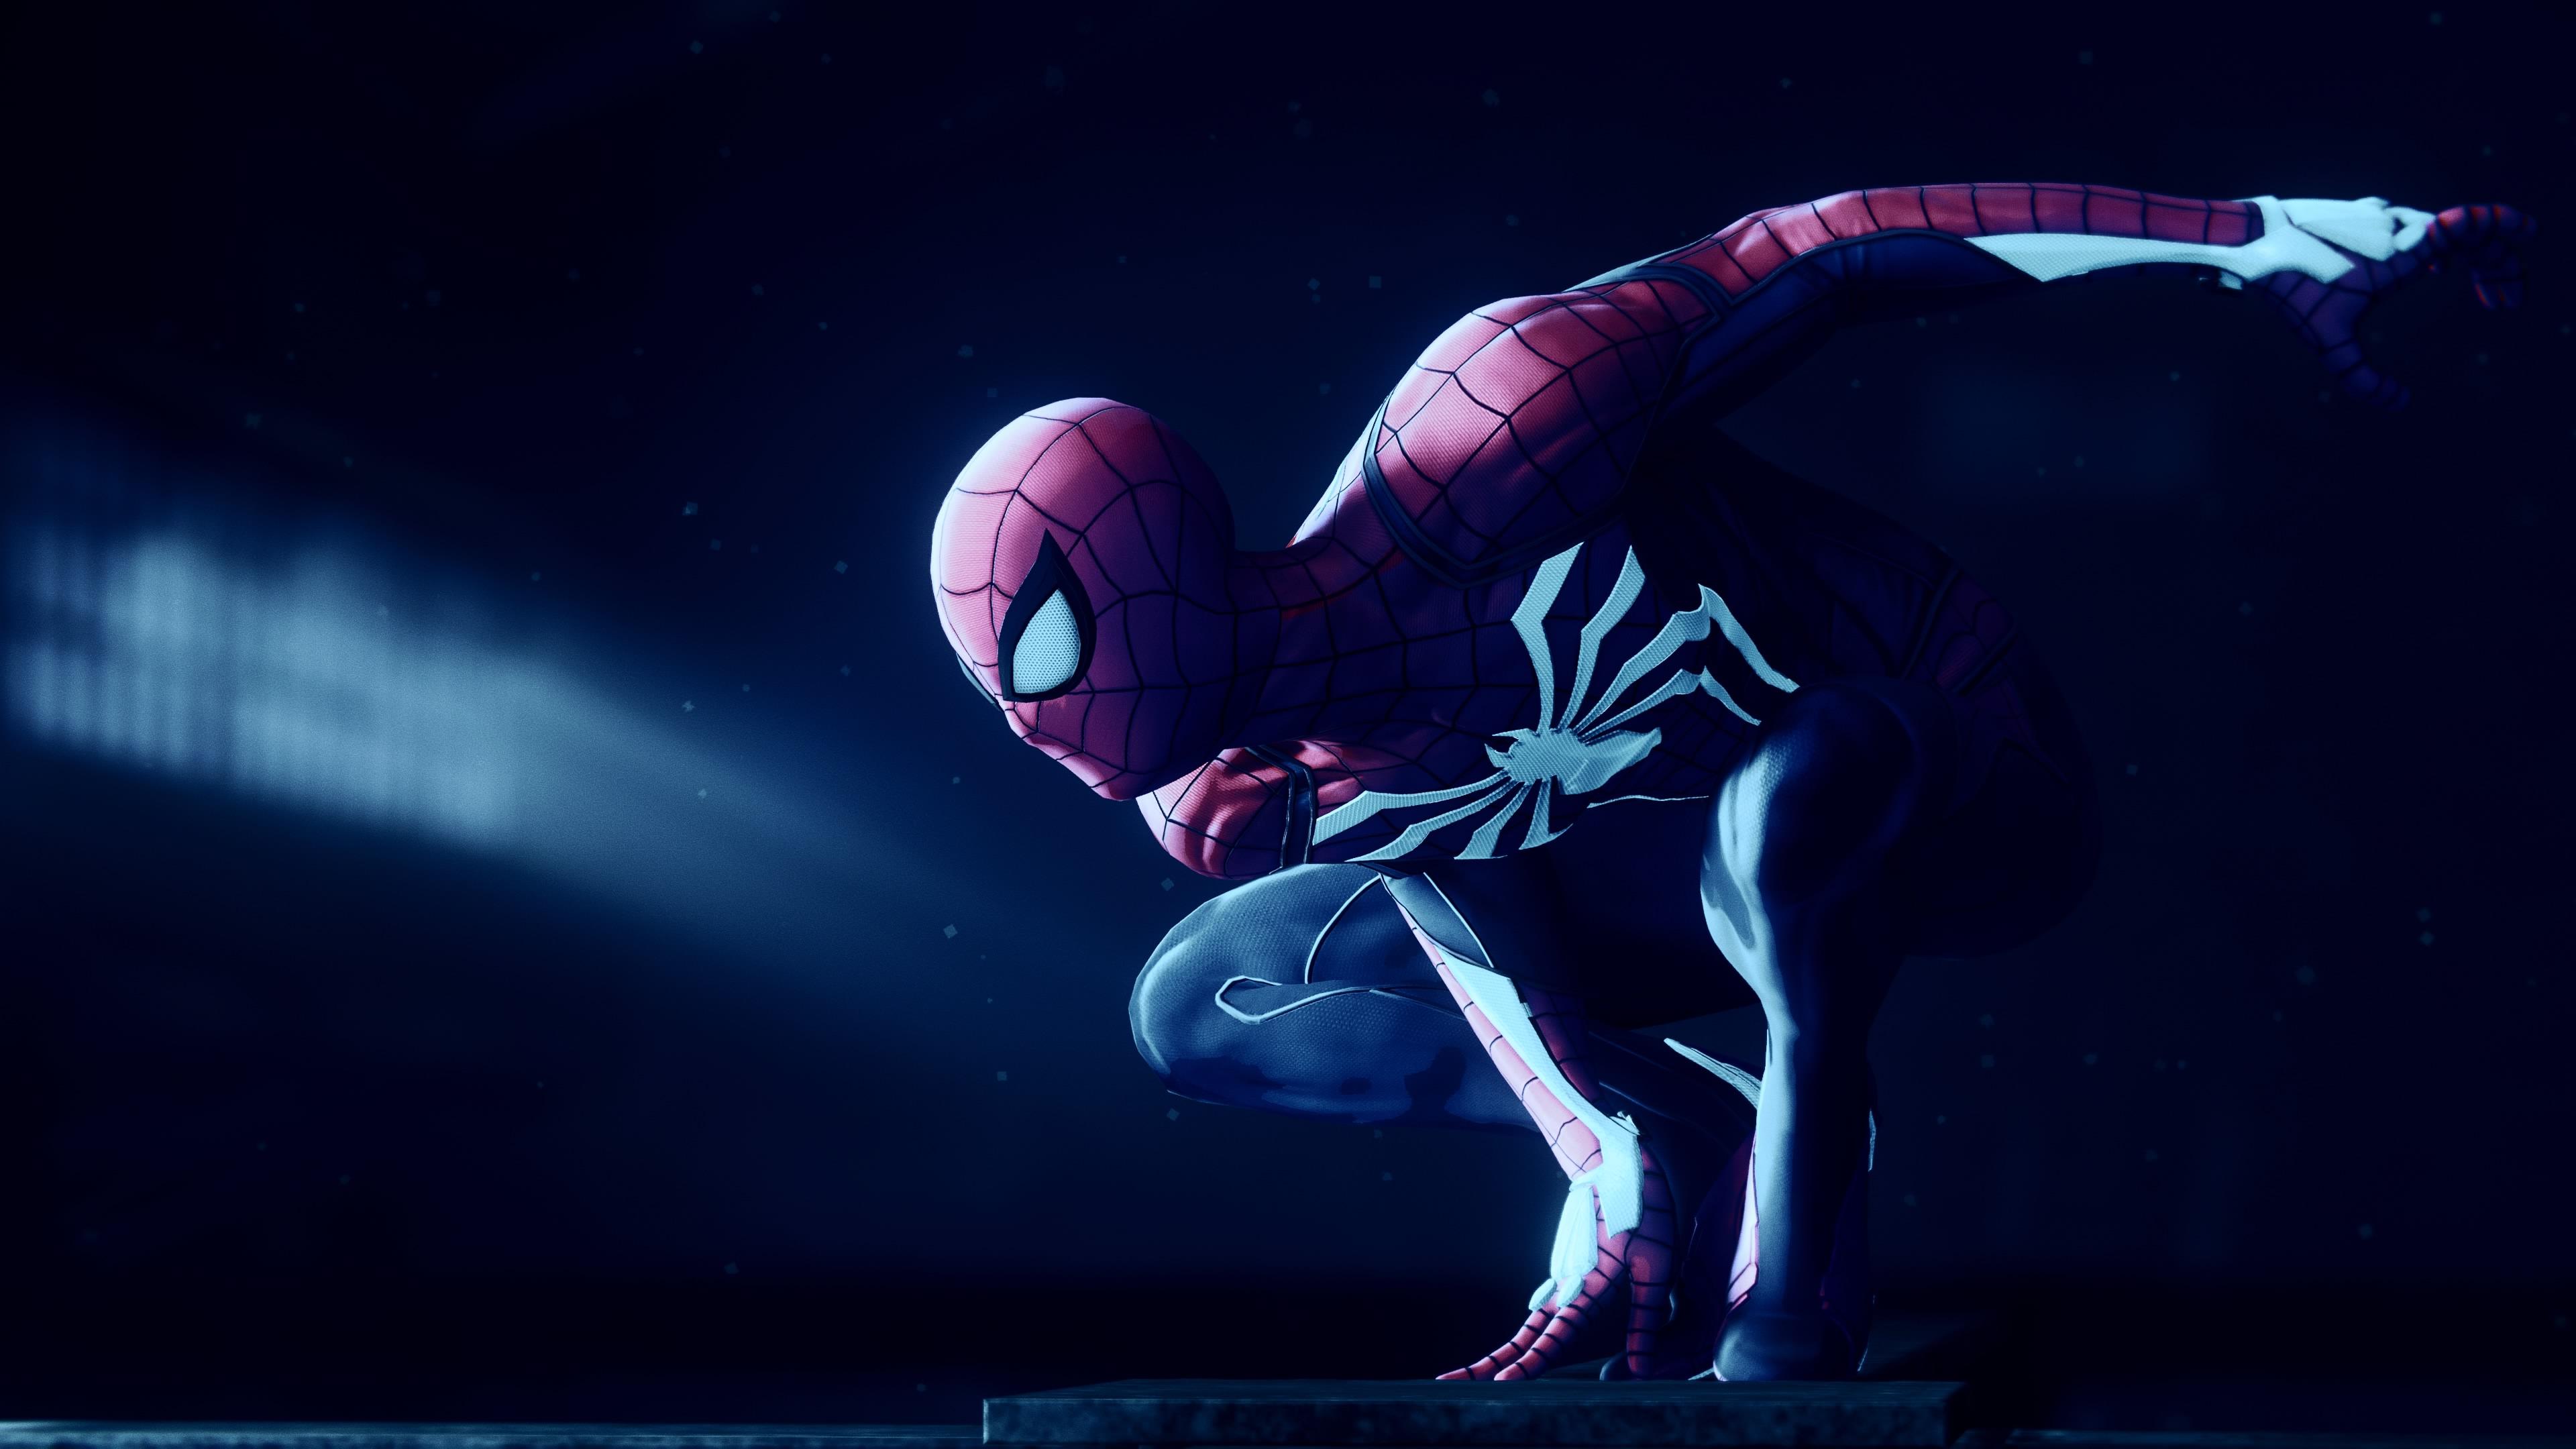 3840x2160 Marvel Spiderman Game 4k 4k HD 4k Wallpapers ...